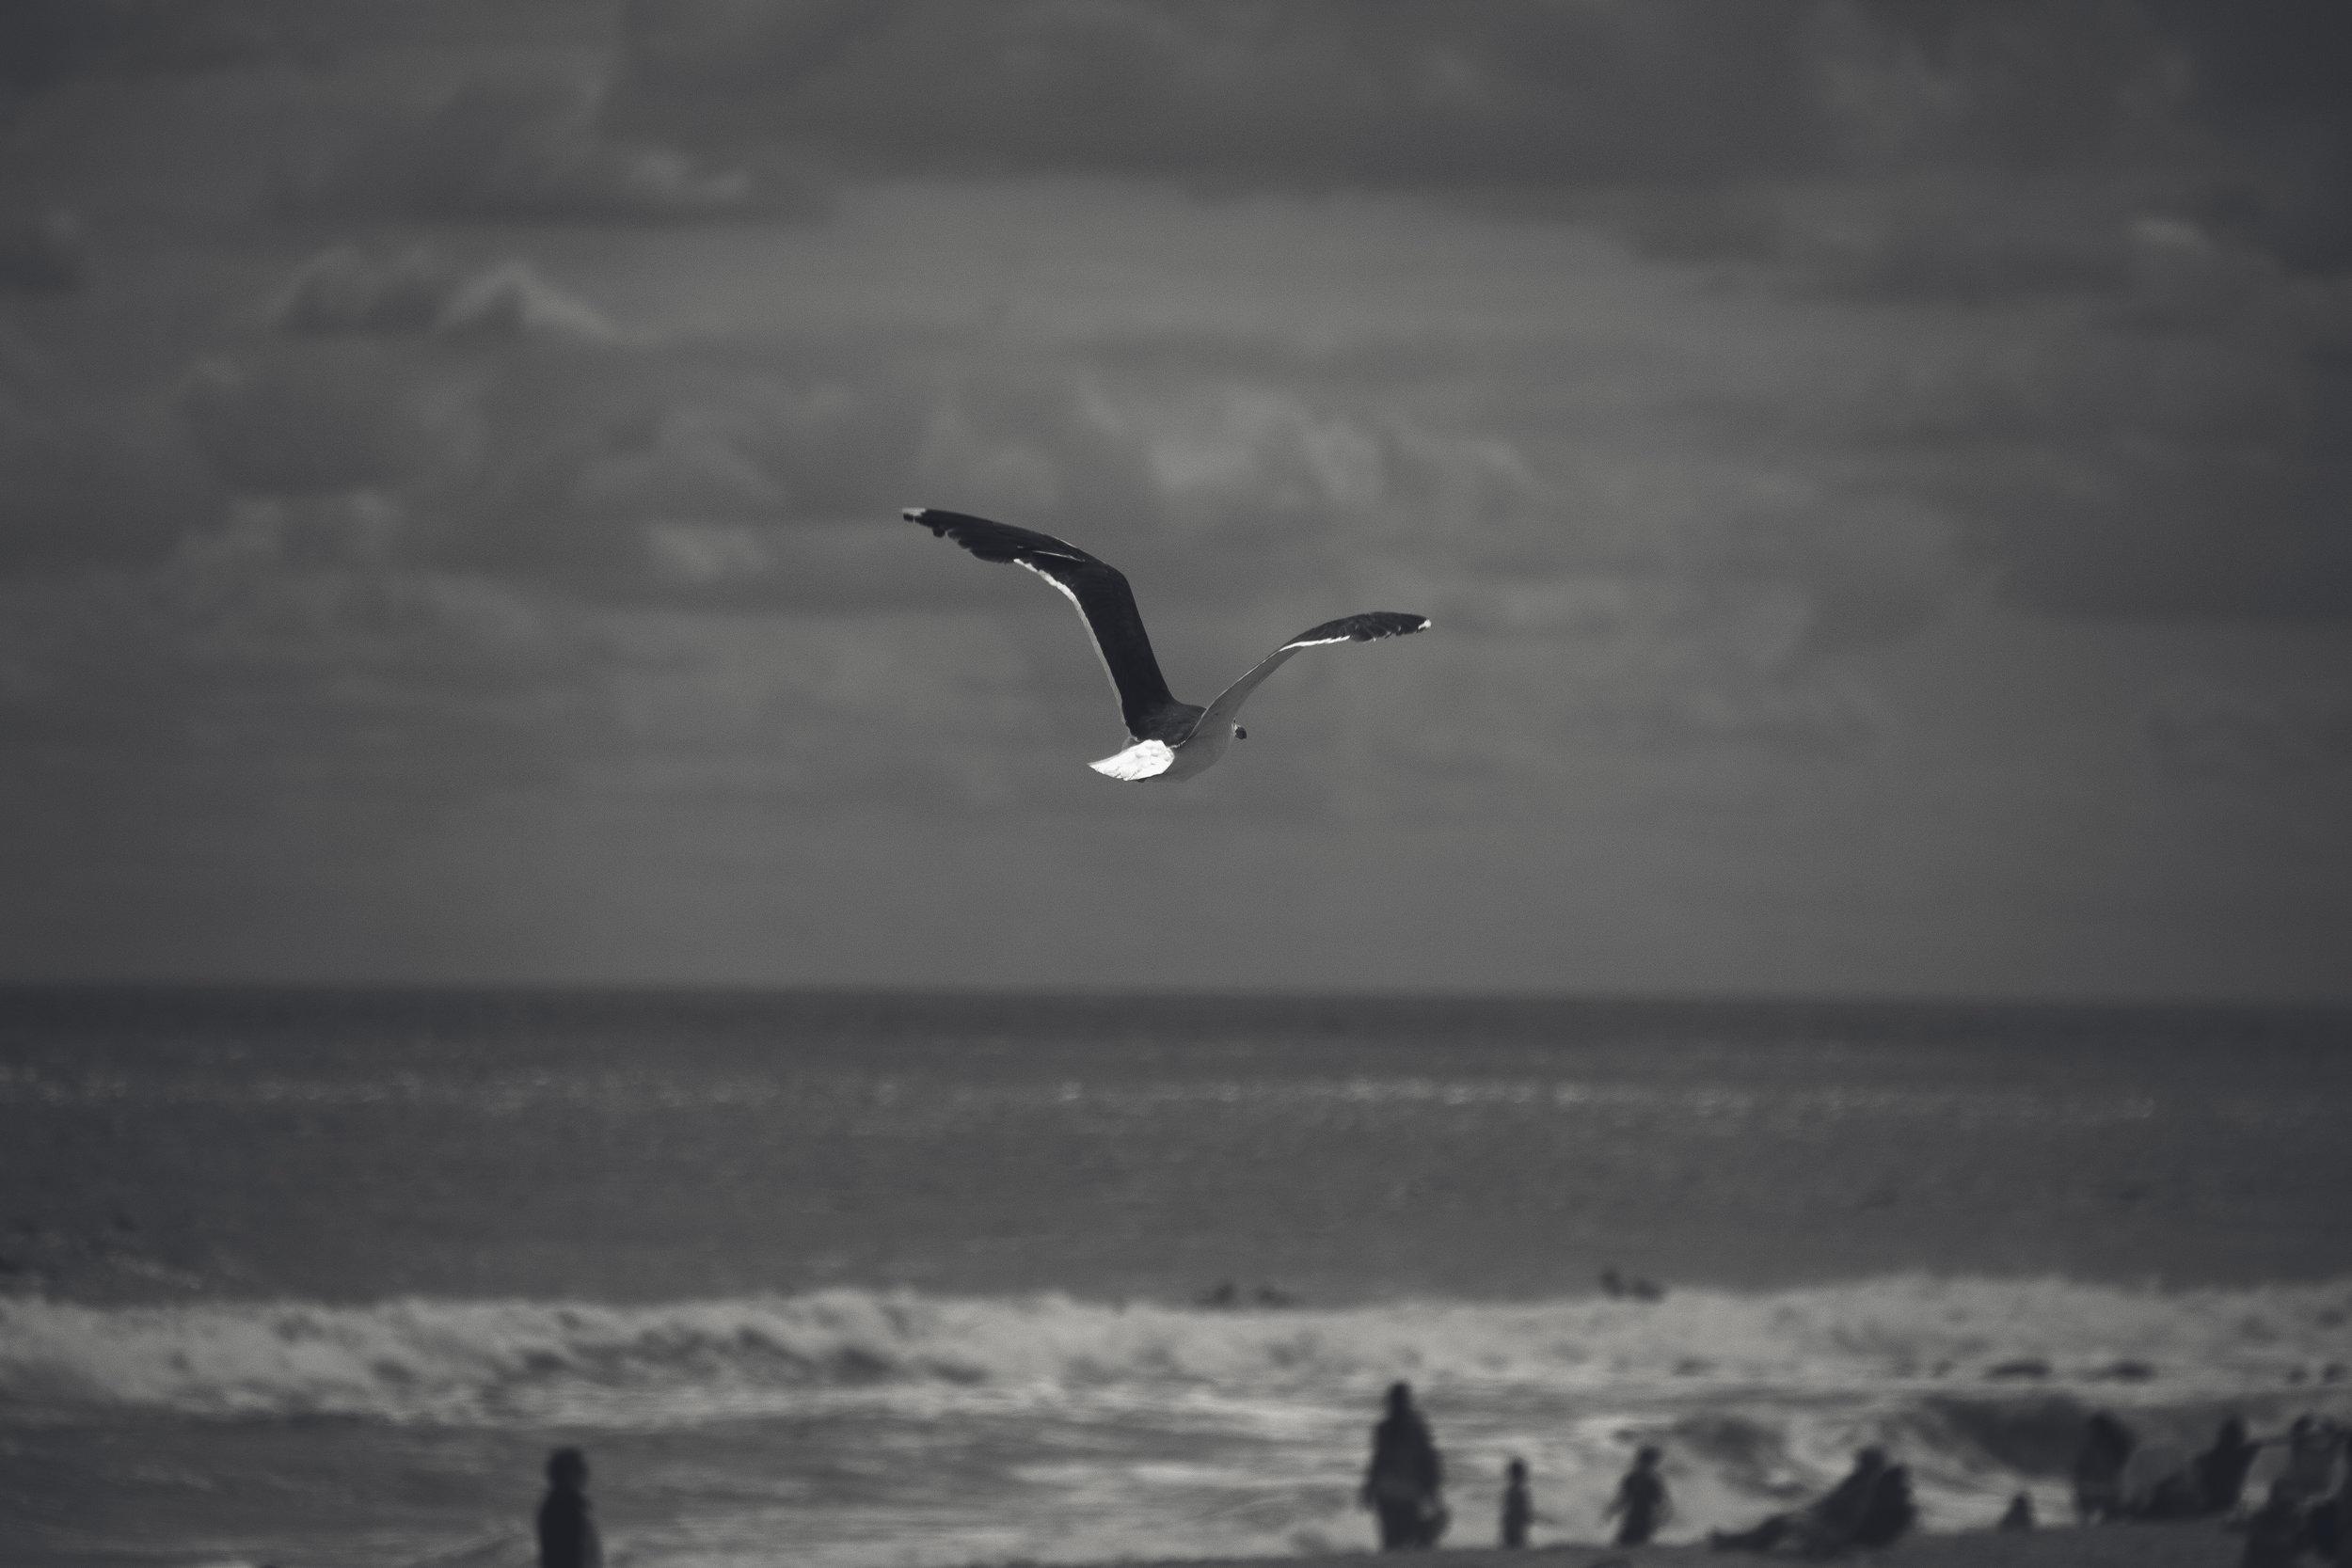 Long Island Beach, New York (USA)